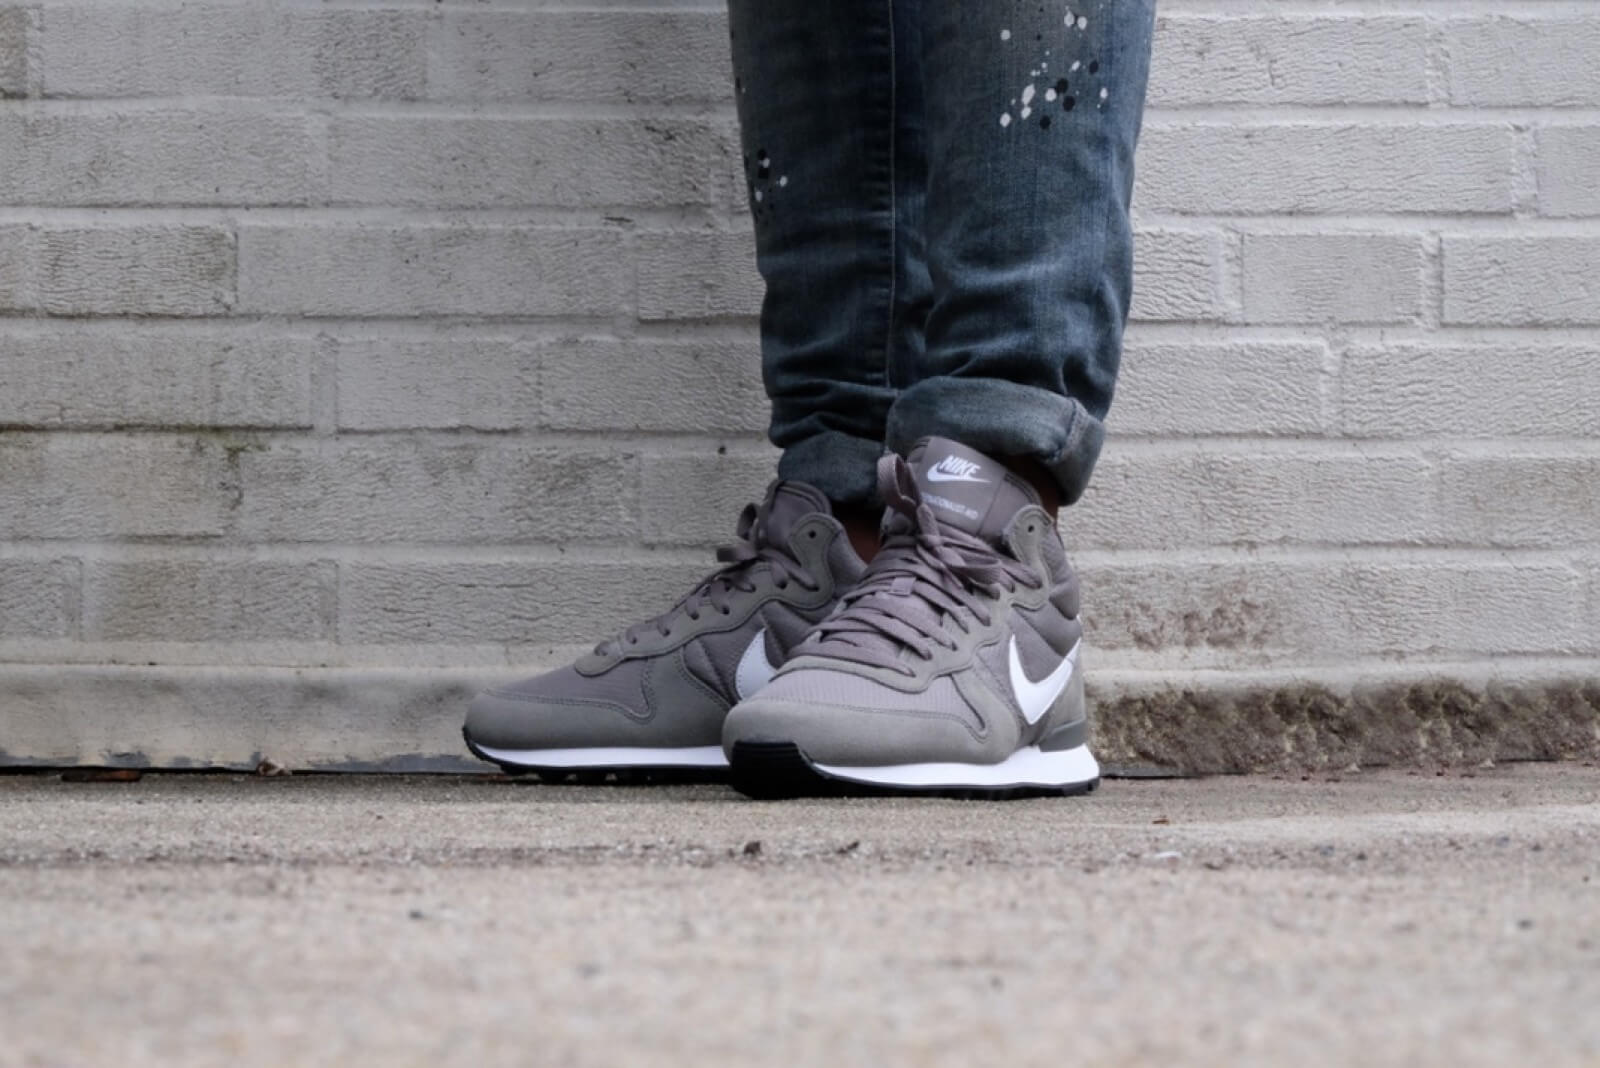 Nike Internationalist Mid Tumbled Grey White White 859478 002